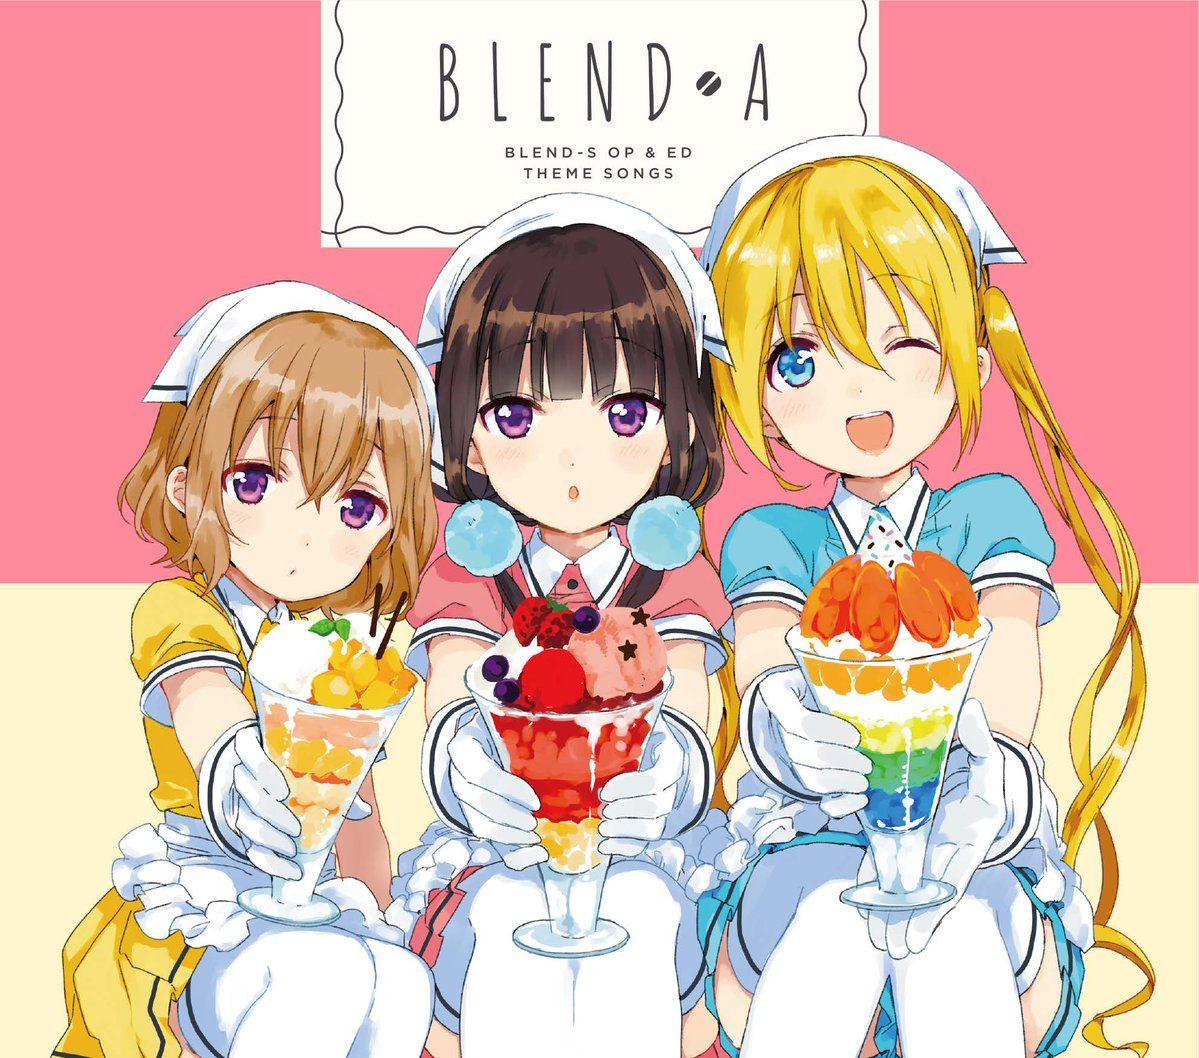 TVアニメ『ブレンド・S』公式 (blend_s_anime) Twitter アニメ 音楽, アニメ